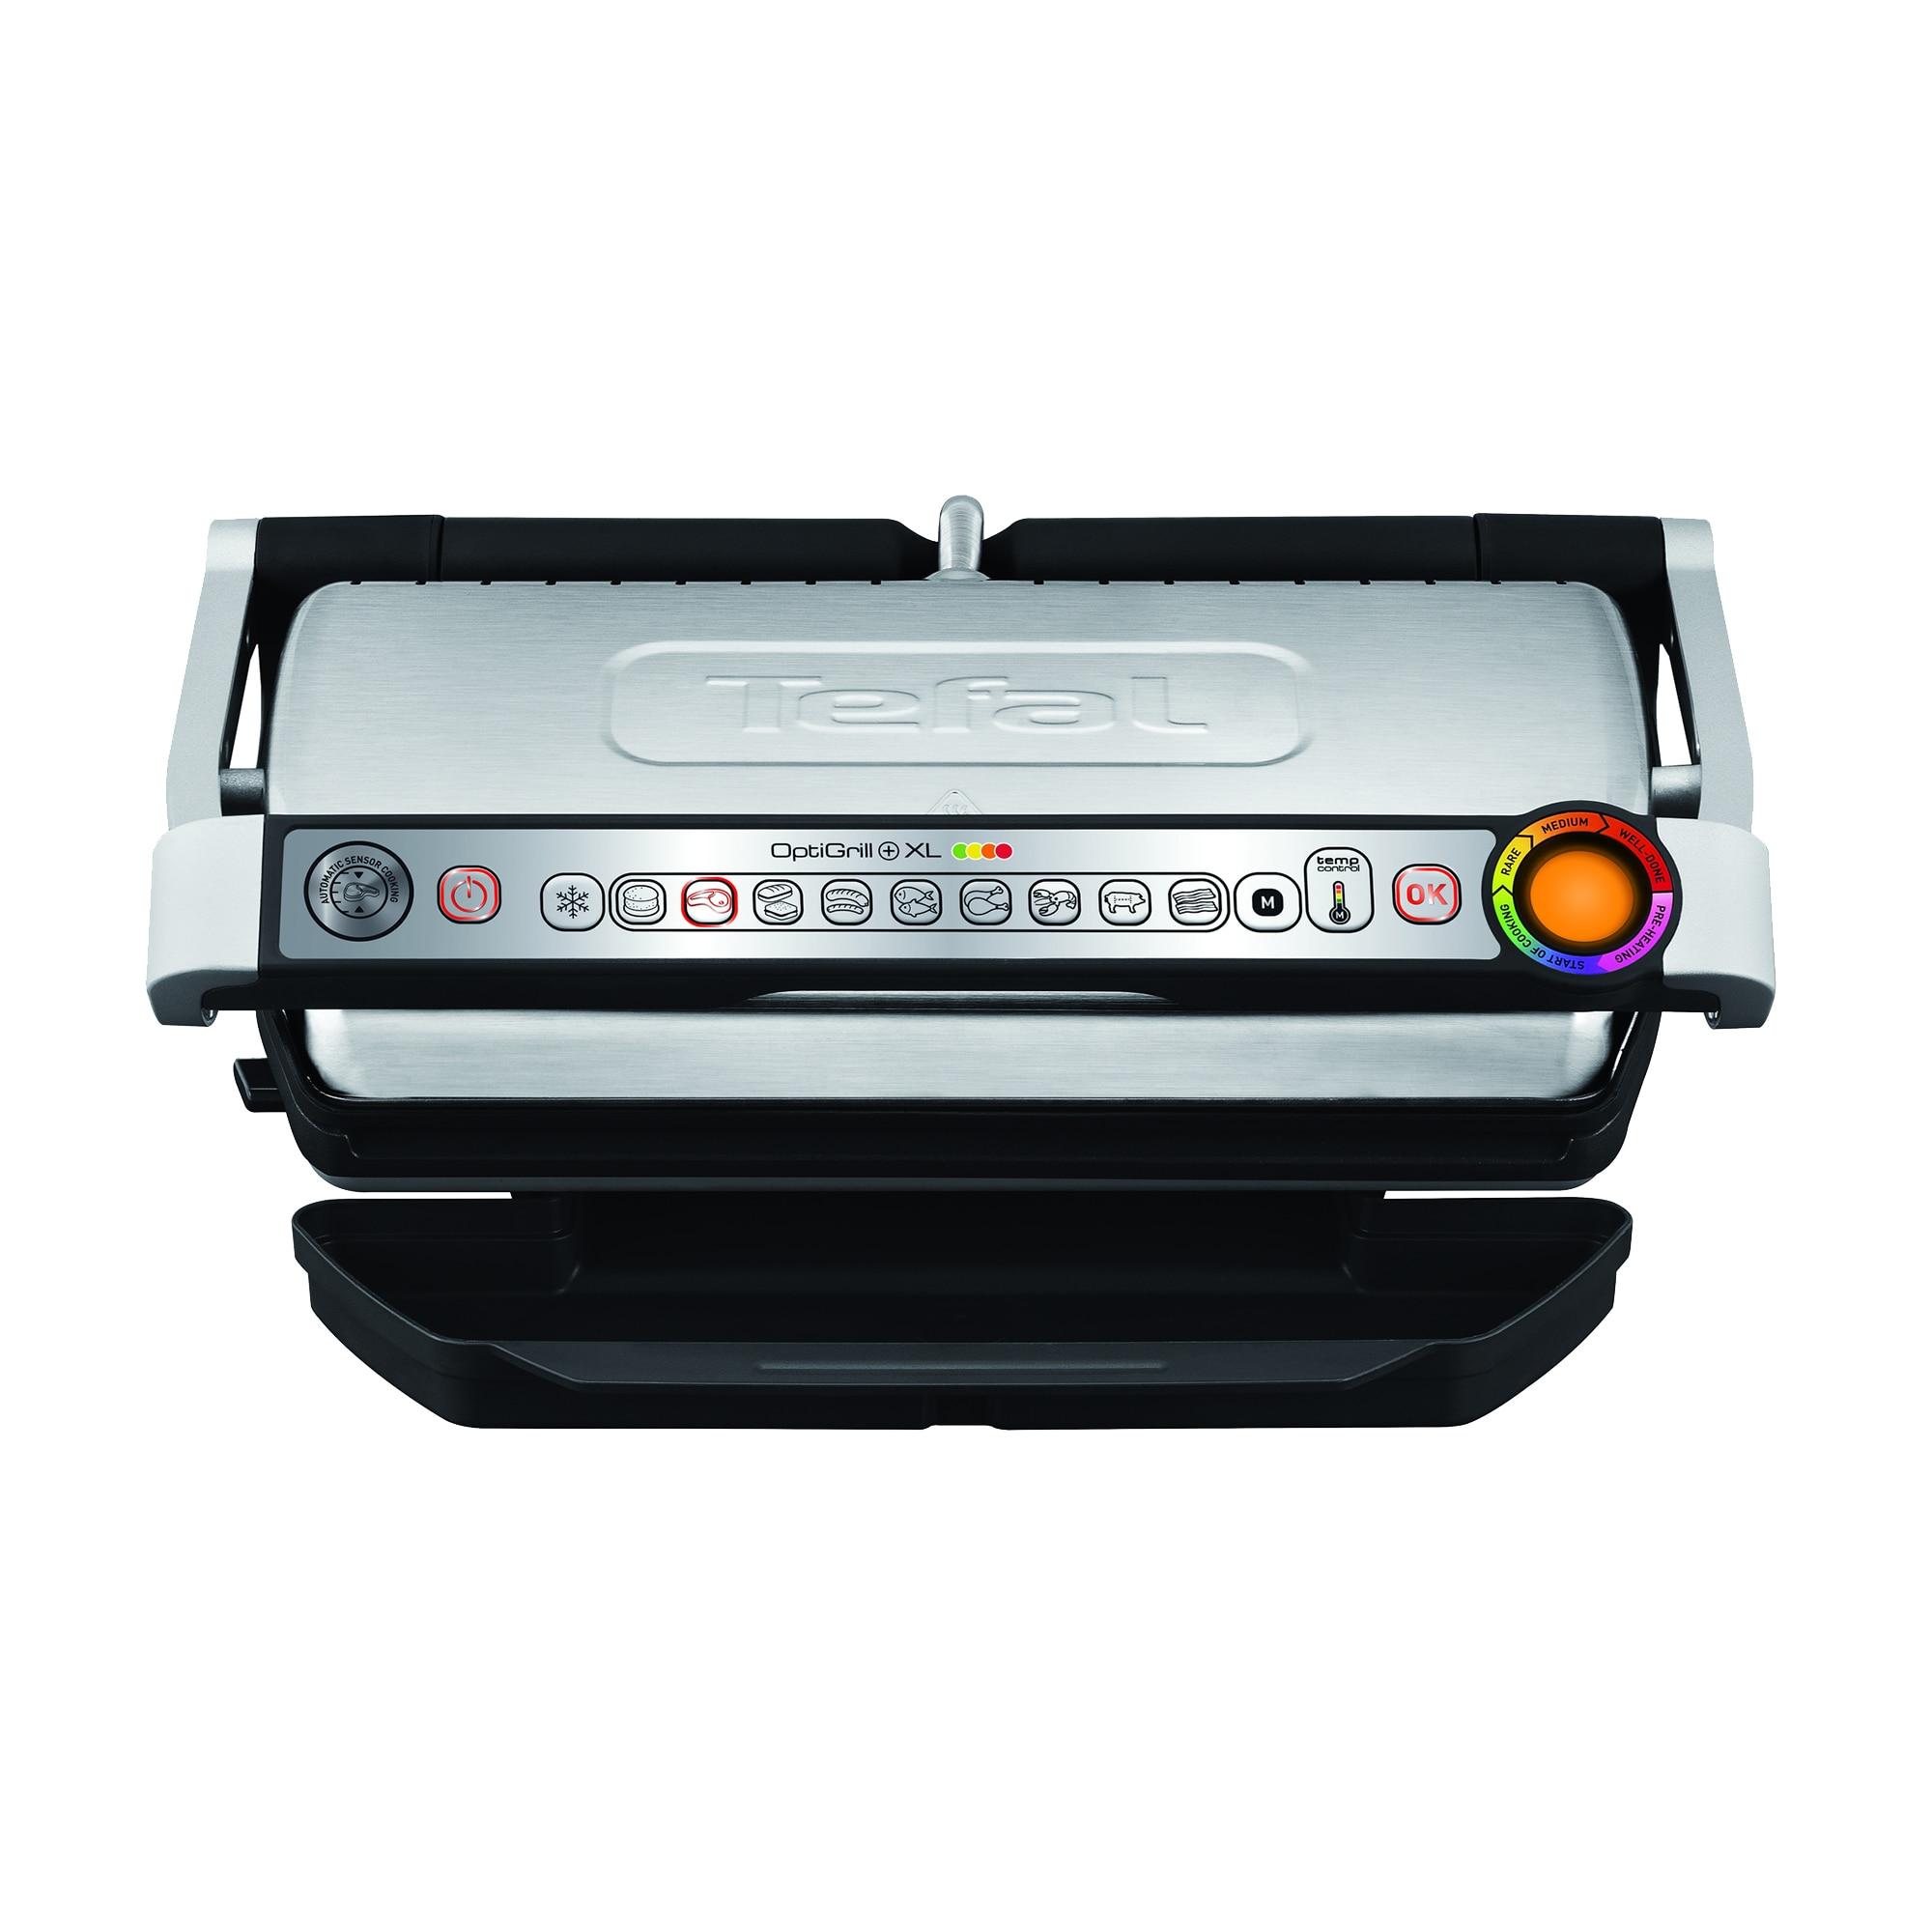 Fotografie Gratar electric TEFAL GC724D12 OptiGrill+ XL Snacking & Baking, 2000W, 9 programe de gatire, indicator pentru nivelul de gatire, argintiu